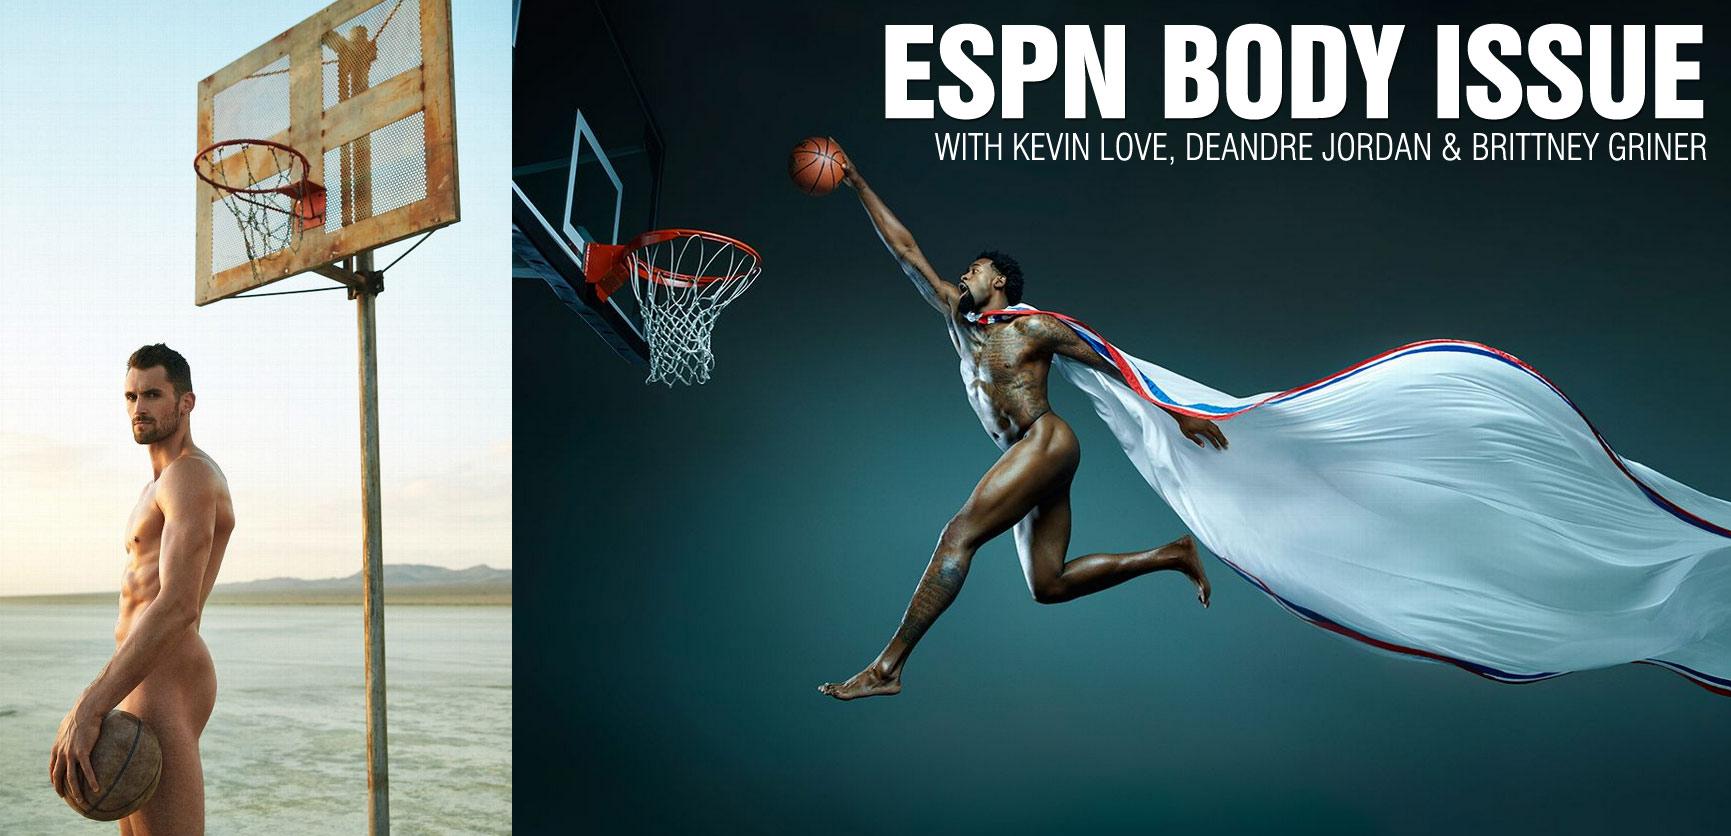 Kevin Love, DeAndre Jordan & Brittney Griner Appear in 2015 ESPN Body Issue